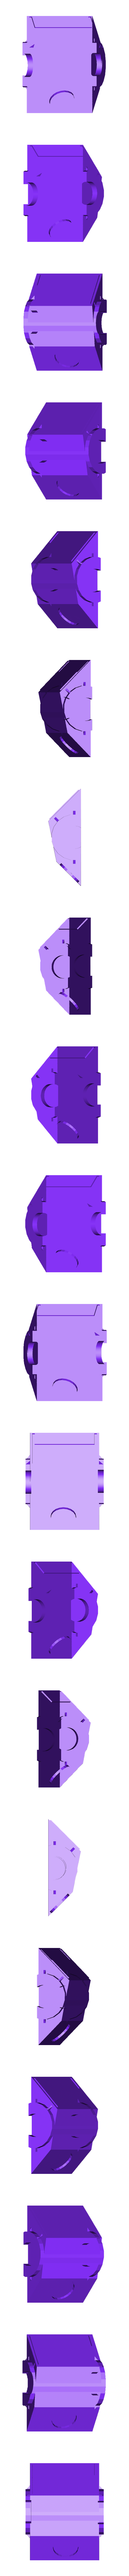 Body_Bottom.stl Download free STL file Interstellar Army - Quad Mortar and Quad Cannon • 3D printing model, Cikkirock